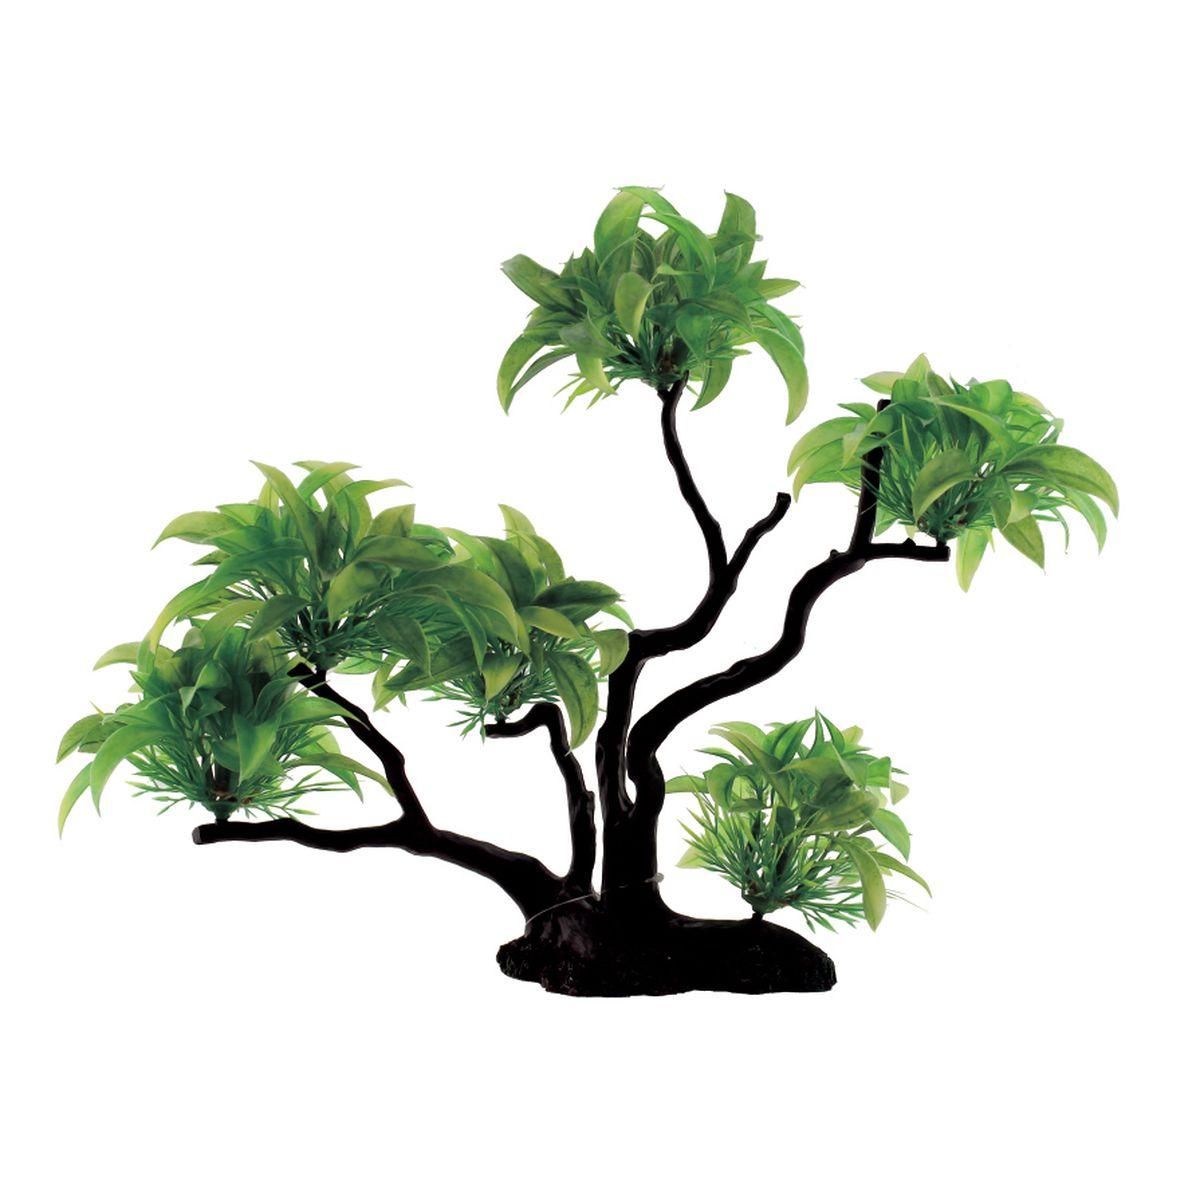 Композиция из растений для аквариума ArtUniq Буцефаландра, 32 x 15 x 30 см0120710Композиция из растений для аквариума ArtUniq Буцефаландра, 32 x 15 x 30 см